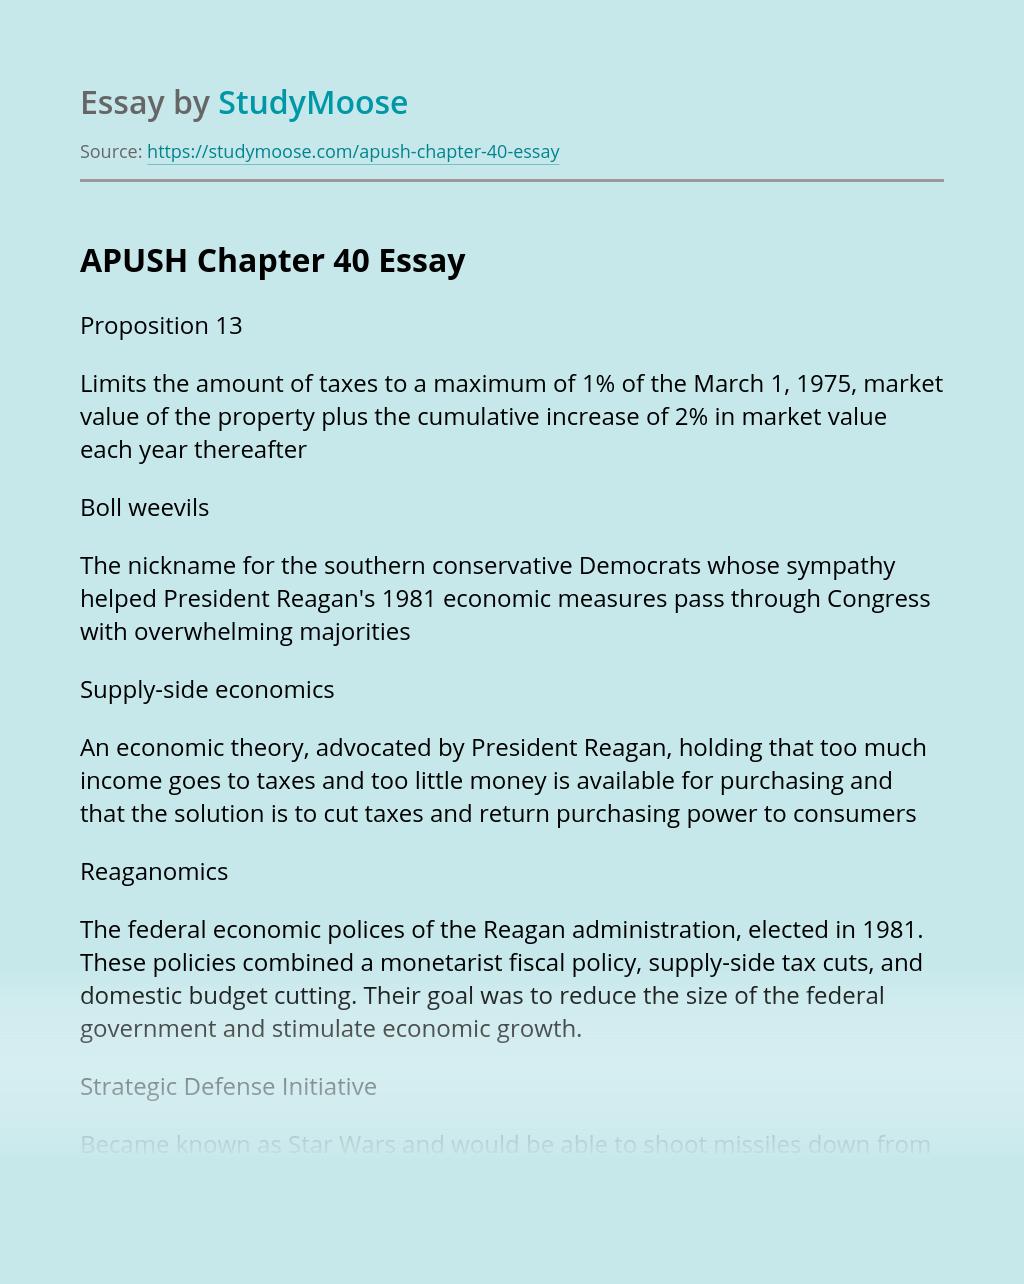 APUSH Chapter 40